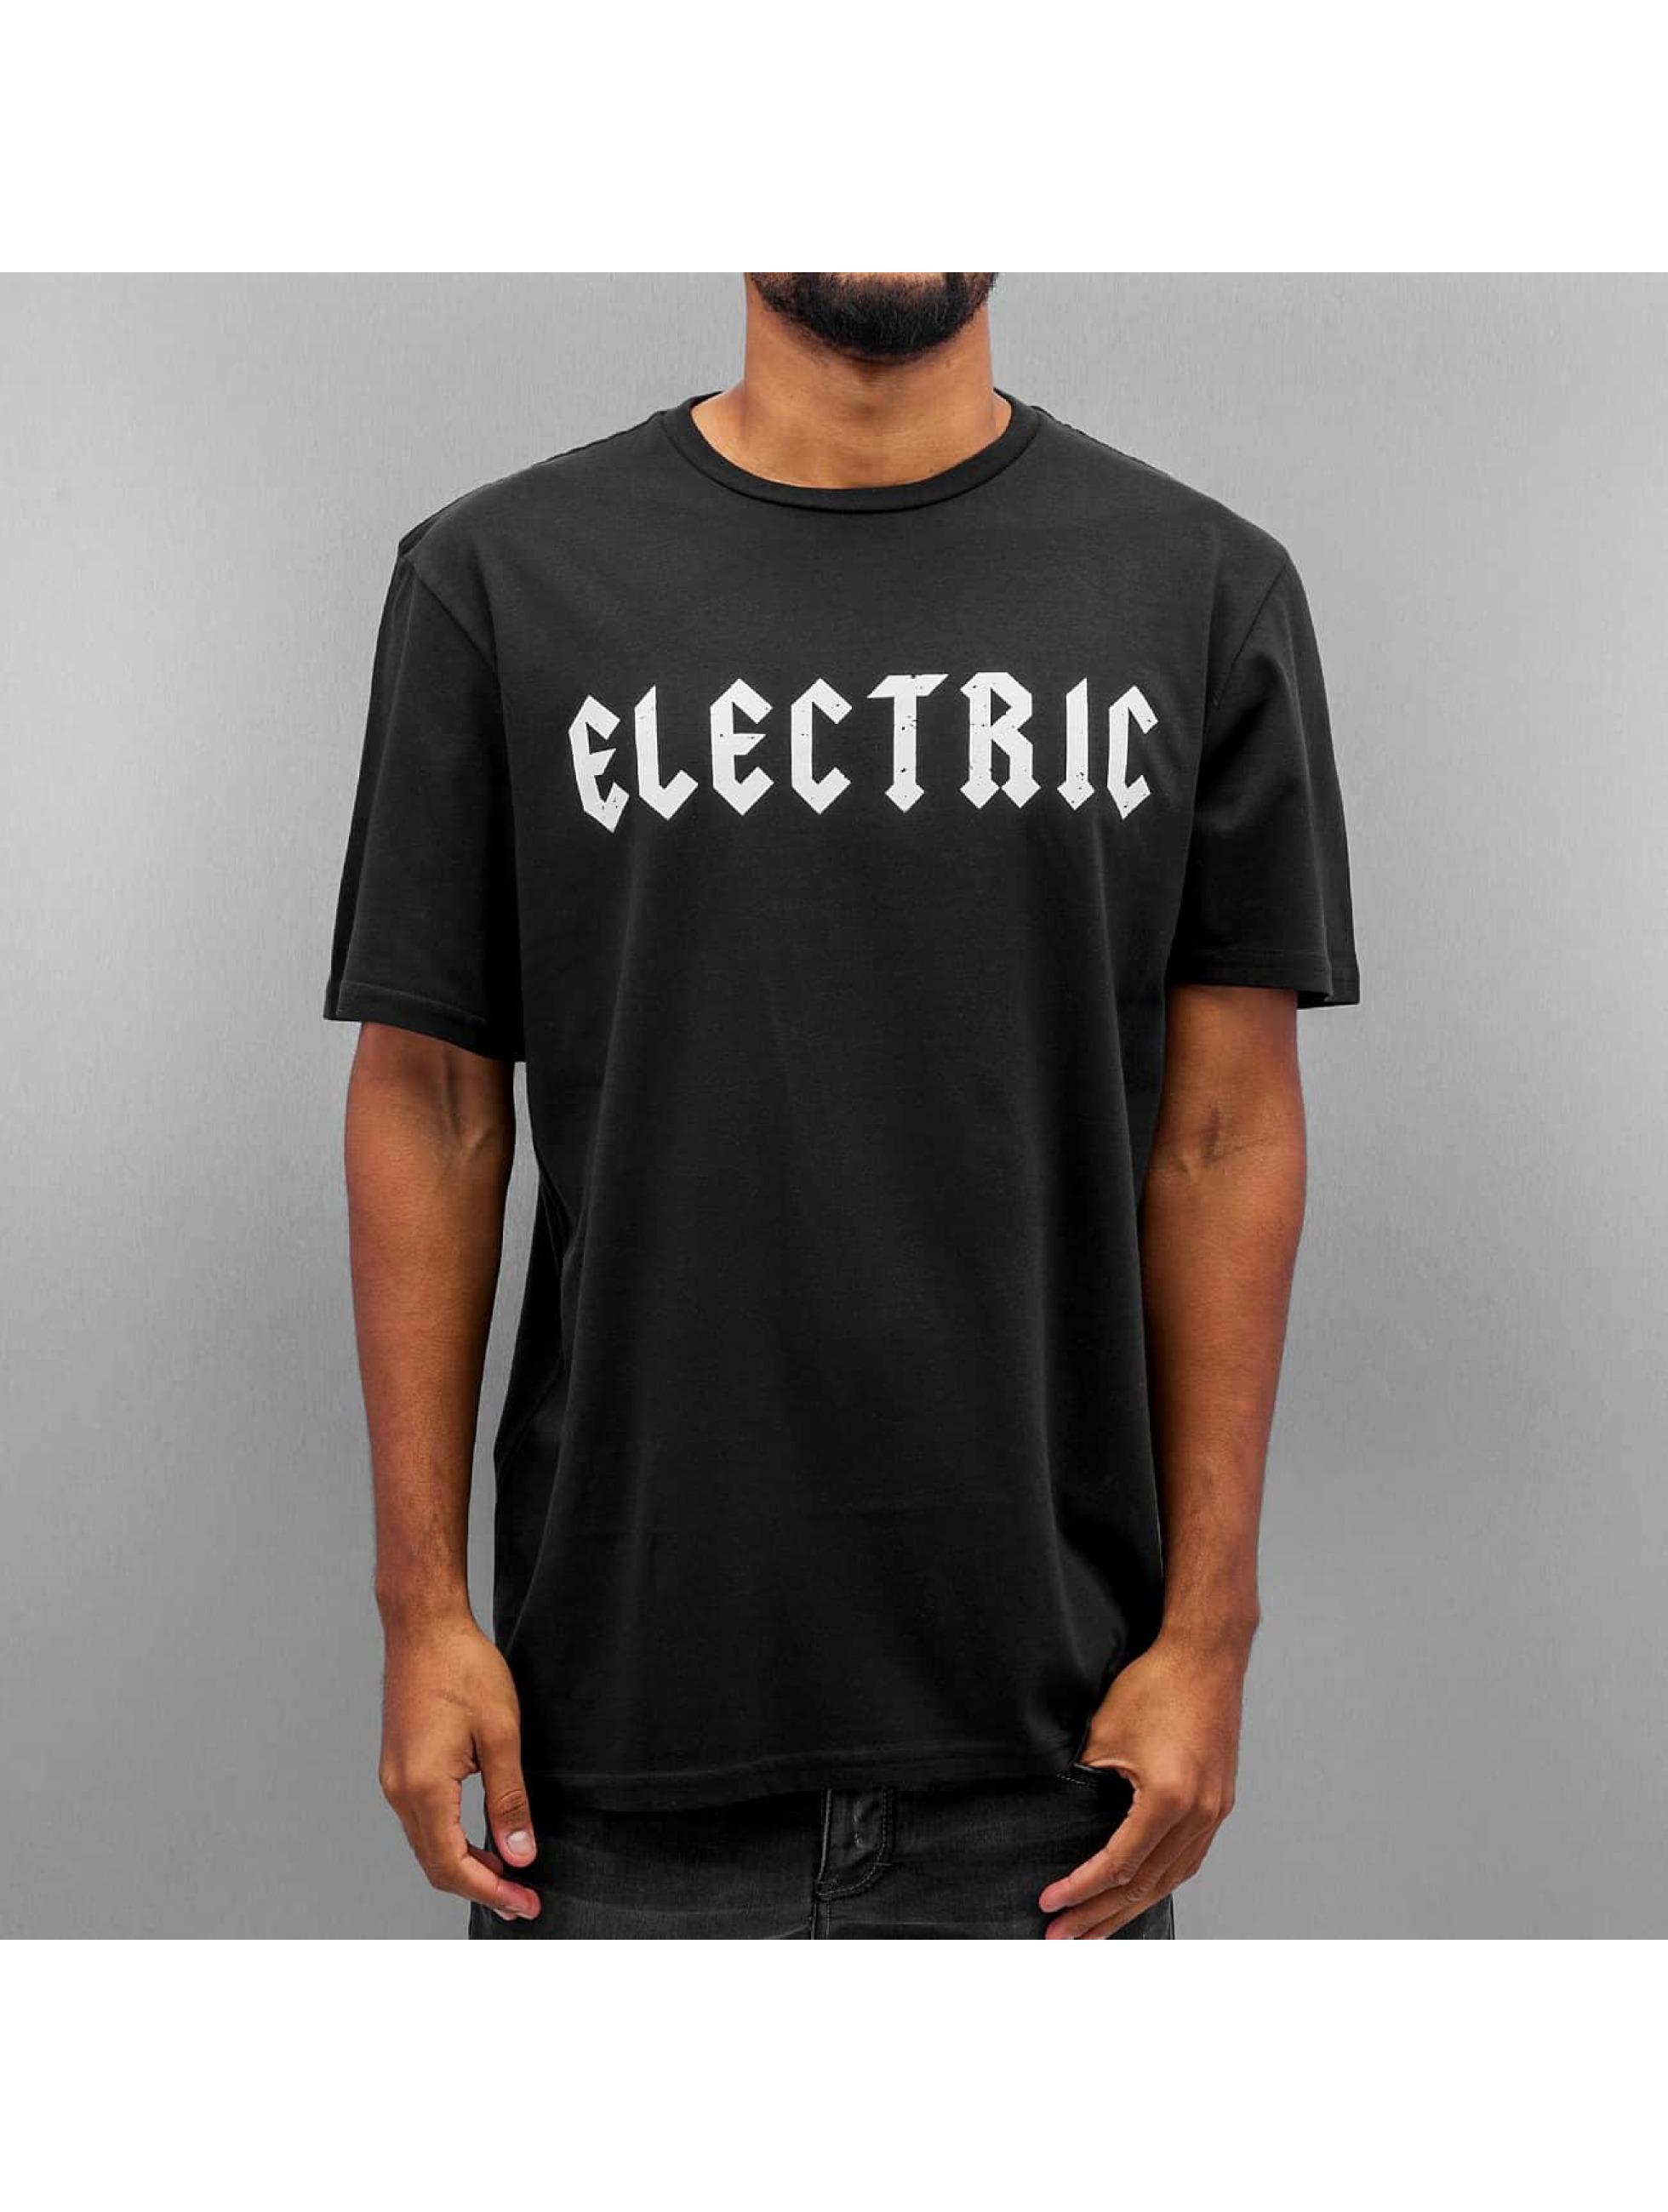 Electric Männer Tall Tees HESSIAN in schwarz